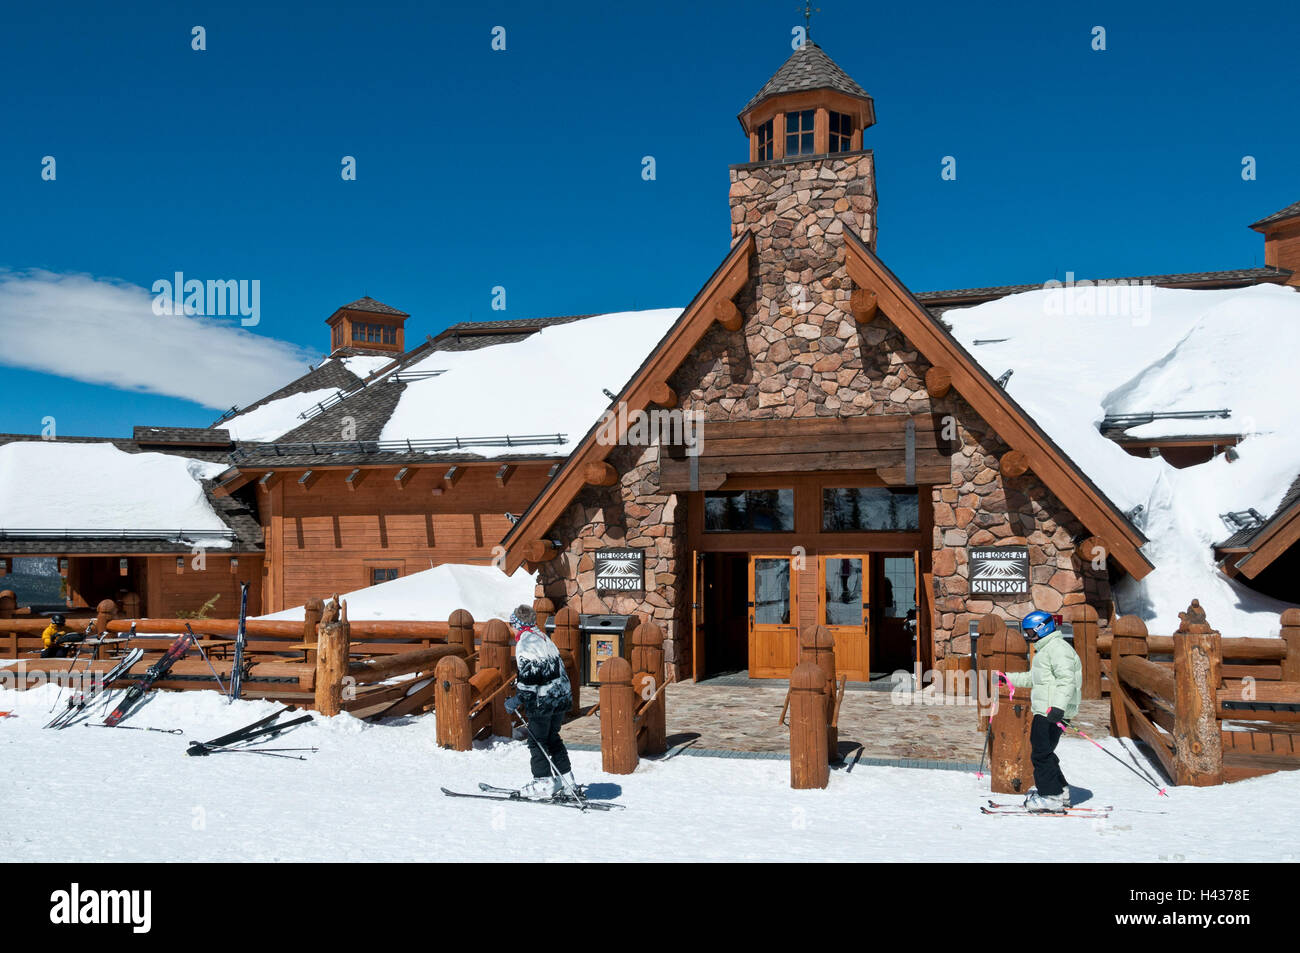 Exterior, the Lodge at Sunspot, Winter Park Ski Resort, Winter Park, Colorado. - Stock Image